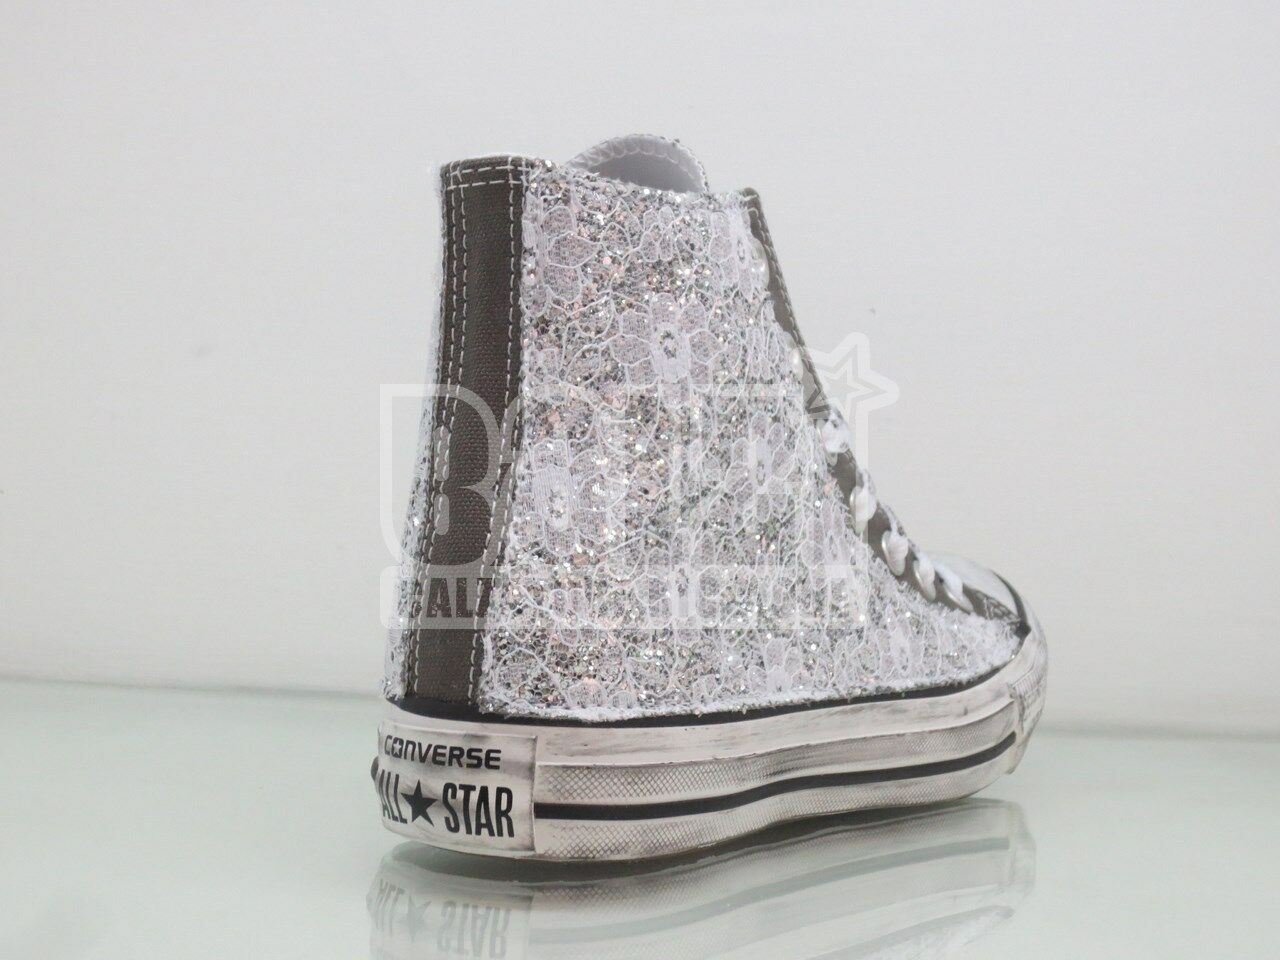 Converse all star glitter gris charcoal  pizzo + glitter star plata  artigianali 69ec8a